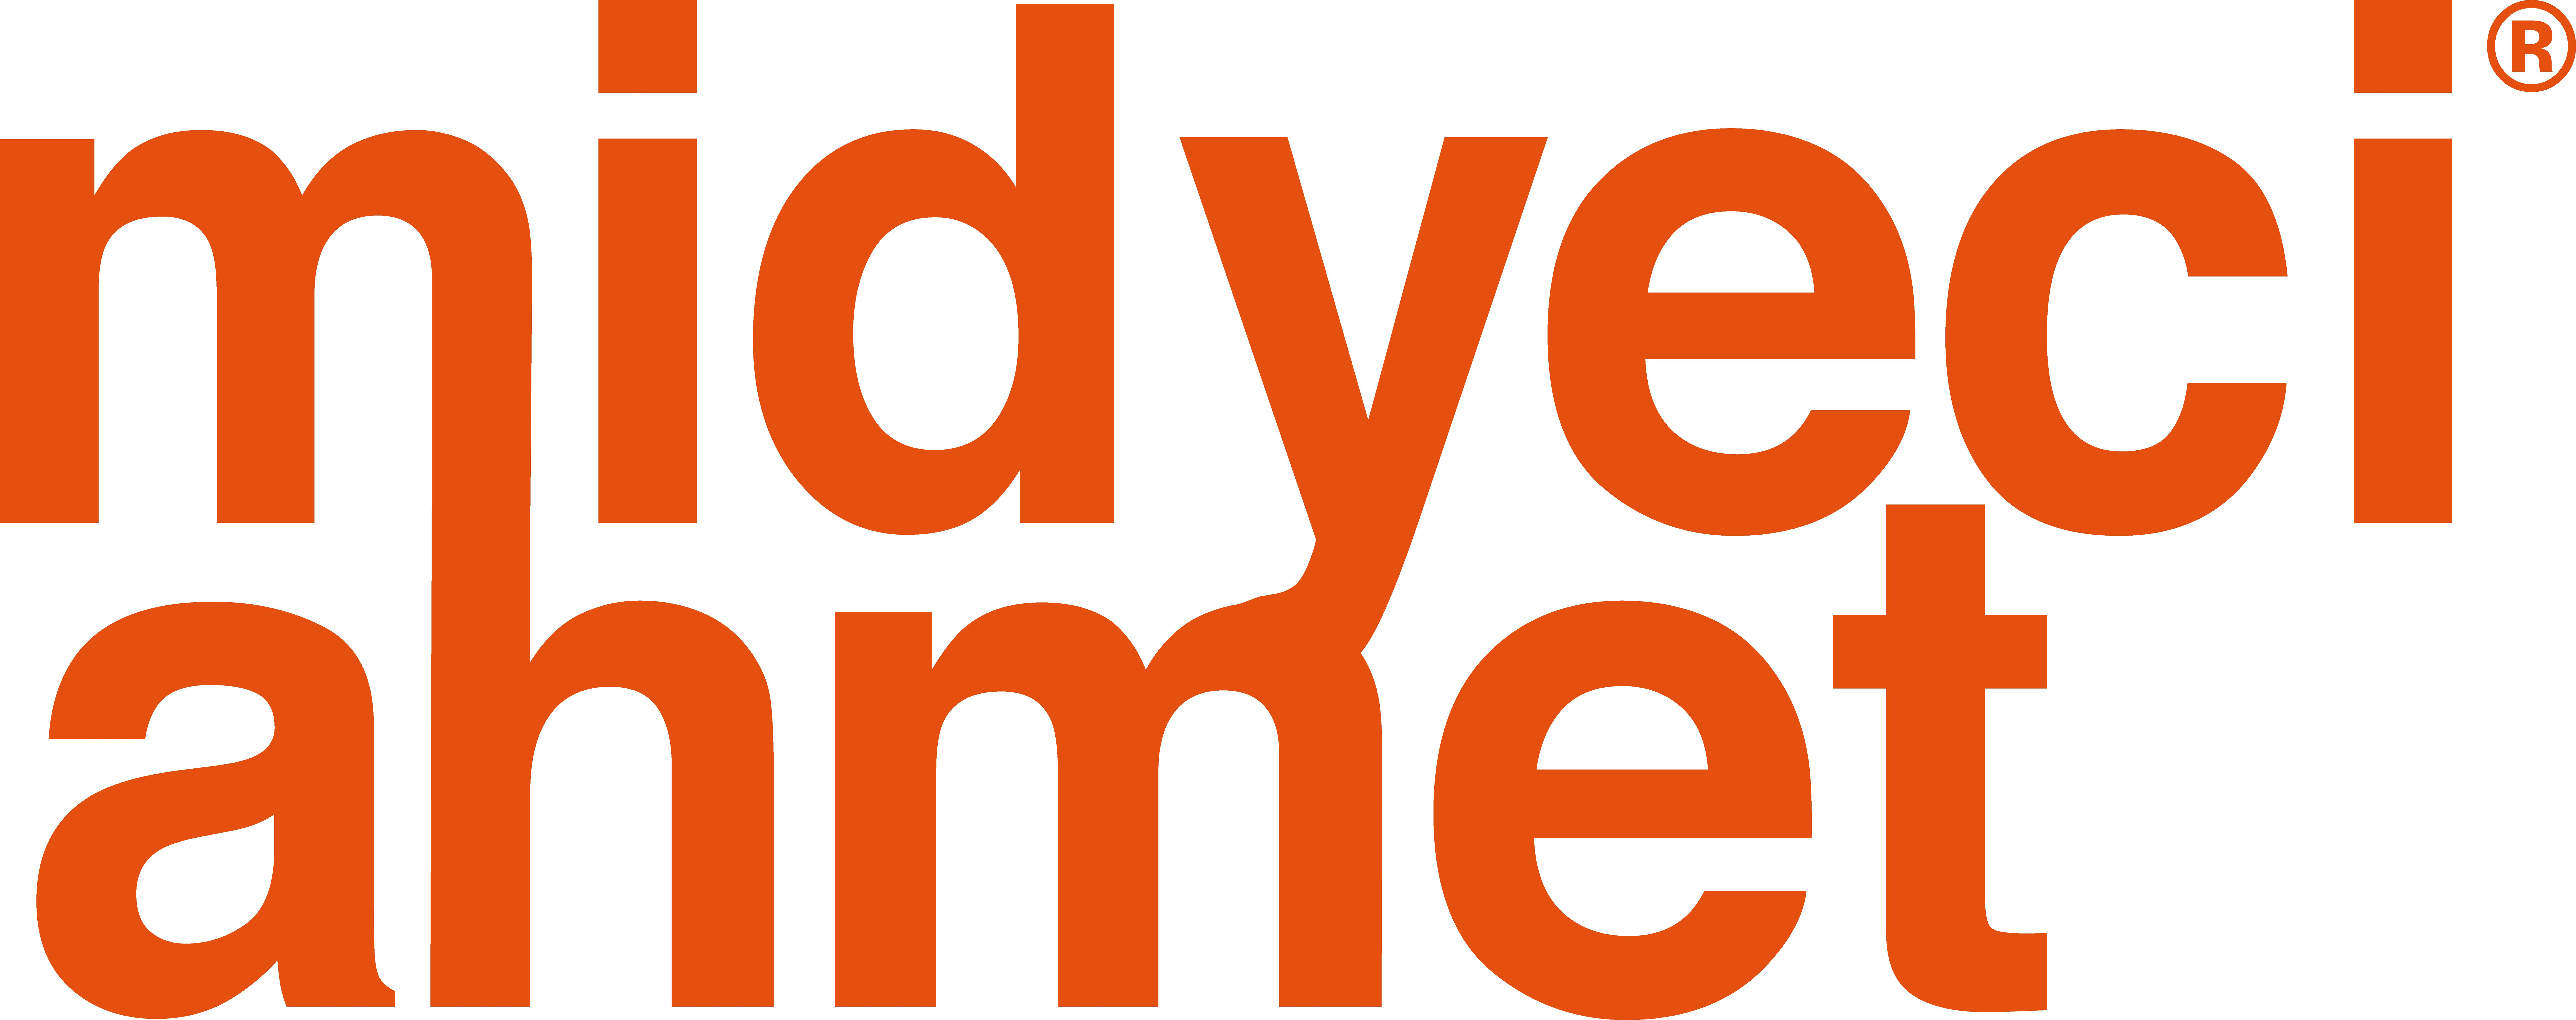 midyeci ahmet logo